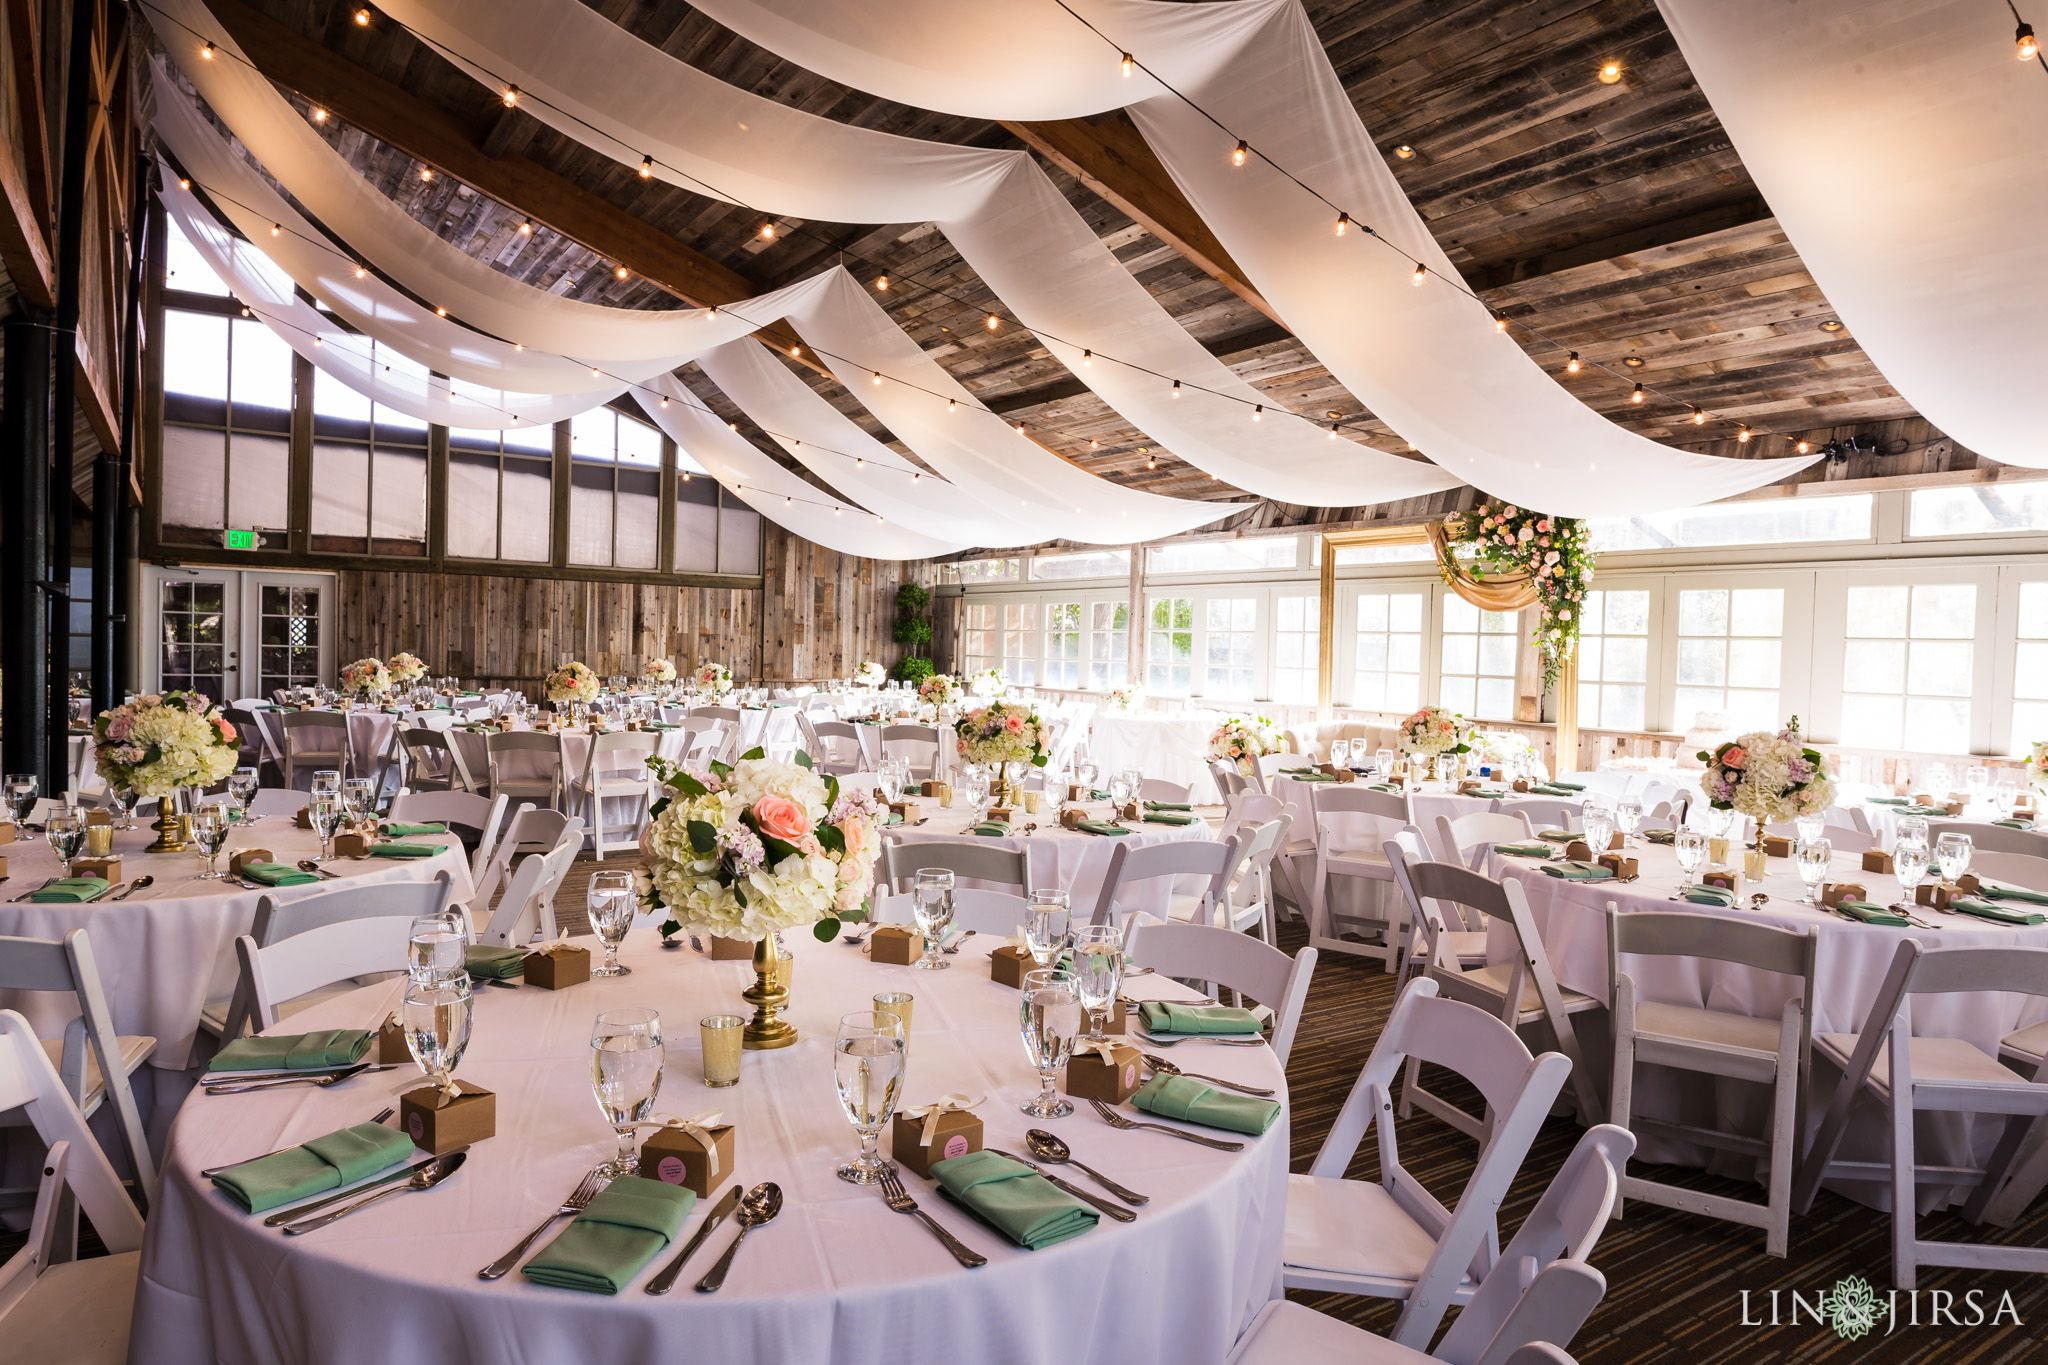 Calamigos Ranch Muslim Wedding (With images) Muslim